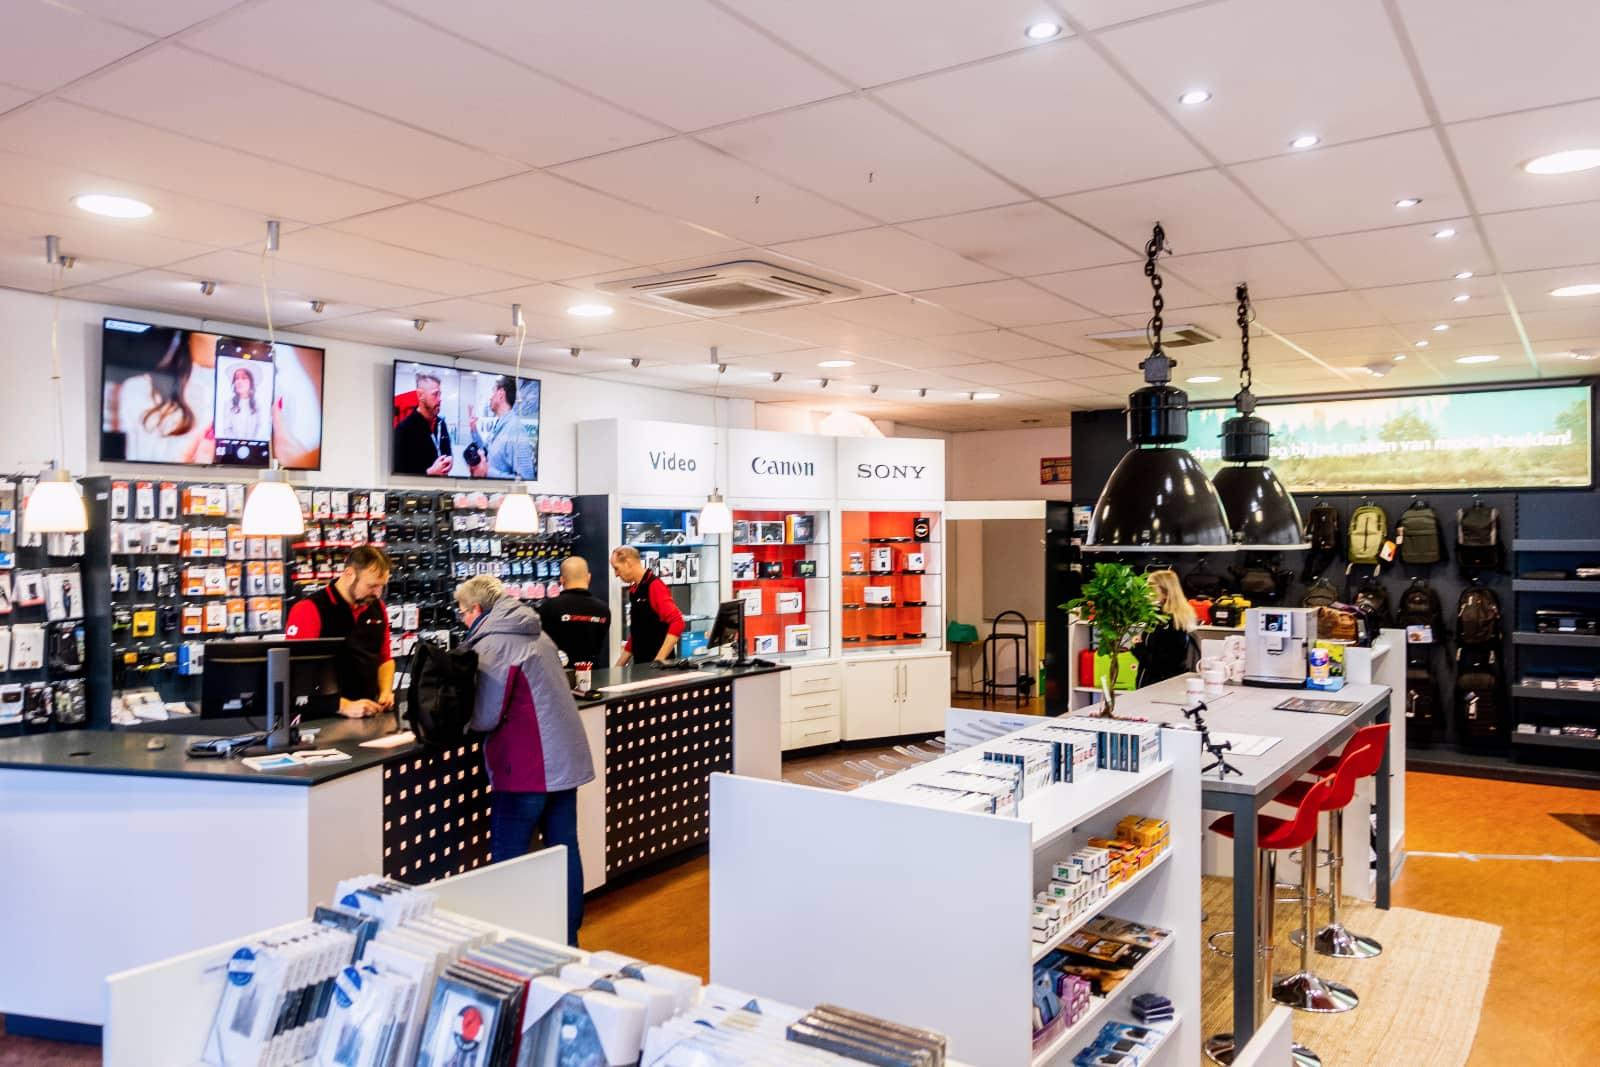 CameraNu winkel in Groningen